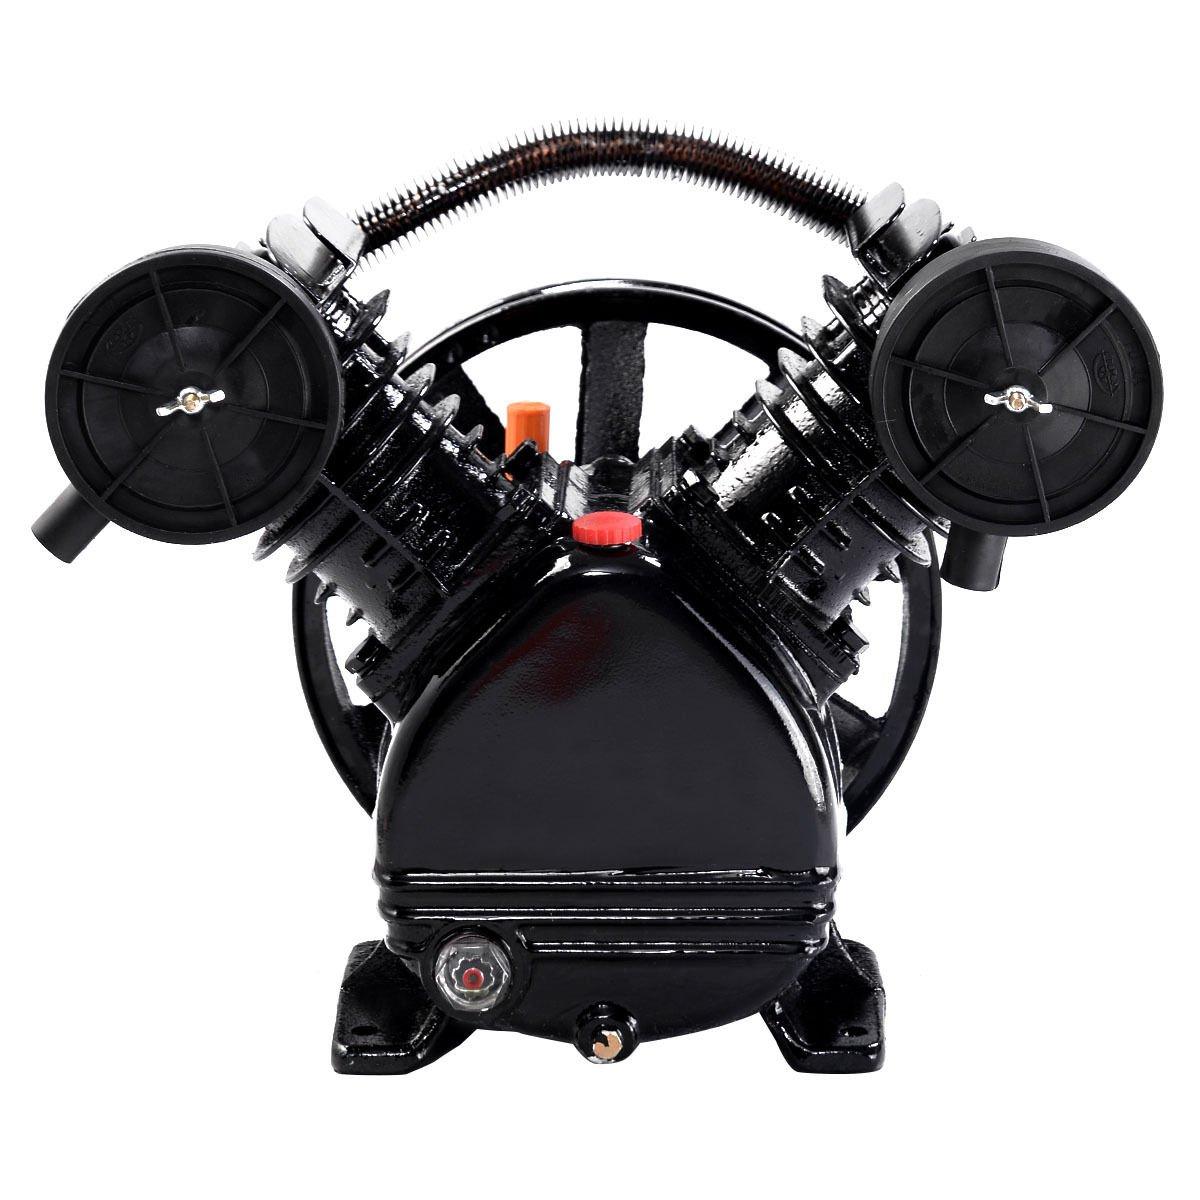 3HP 2 Piston V Style Twin Cylinder Air Compressor Pump Motor Head Air Tool Lotus Analin TL31105